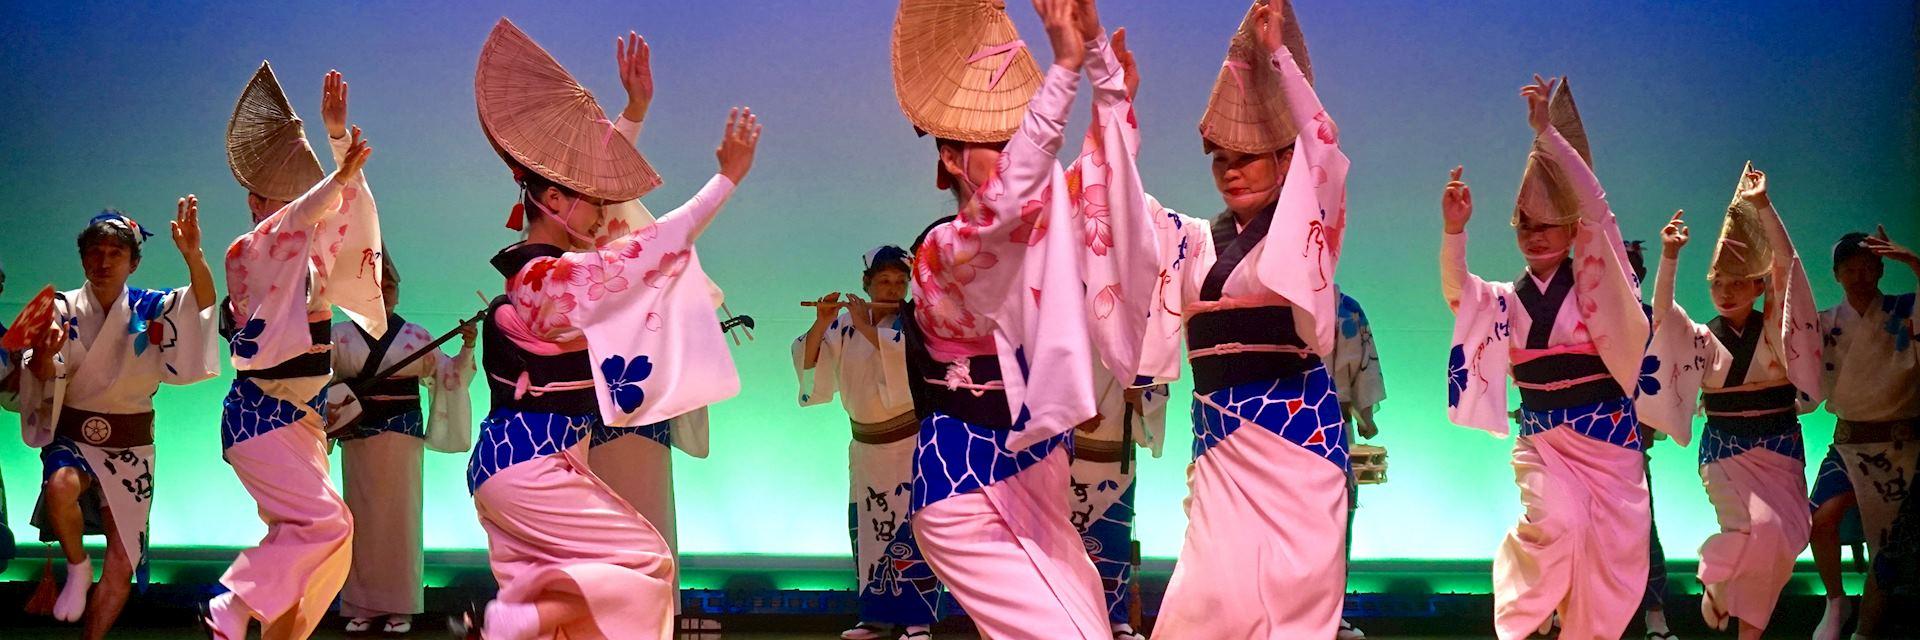 Awa Odori dance performance, Tokushima